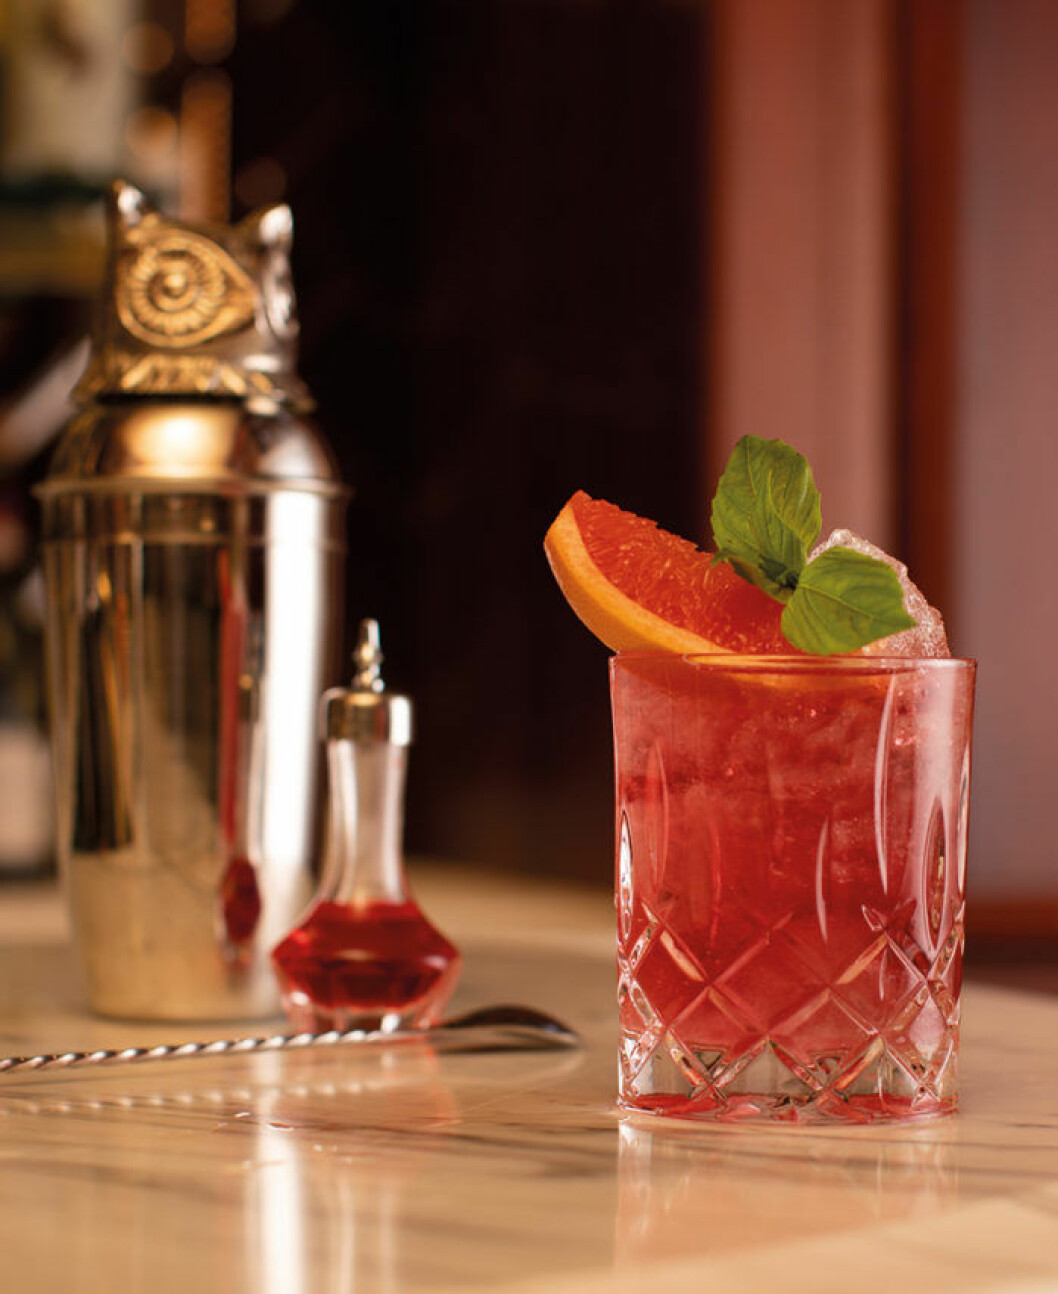 Den alkoholfria drinken Negroni 94 från Bank Hotel.